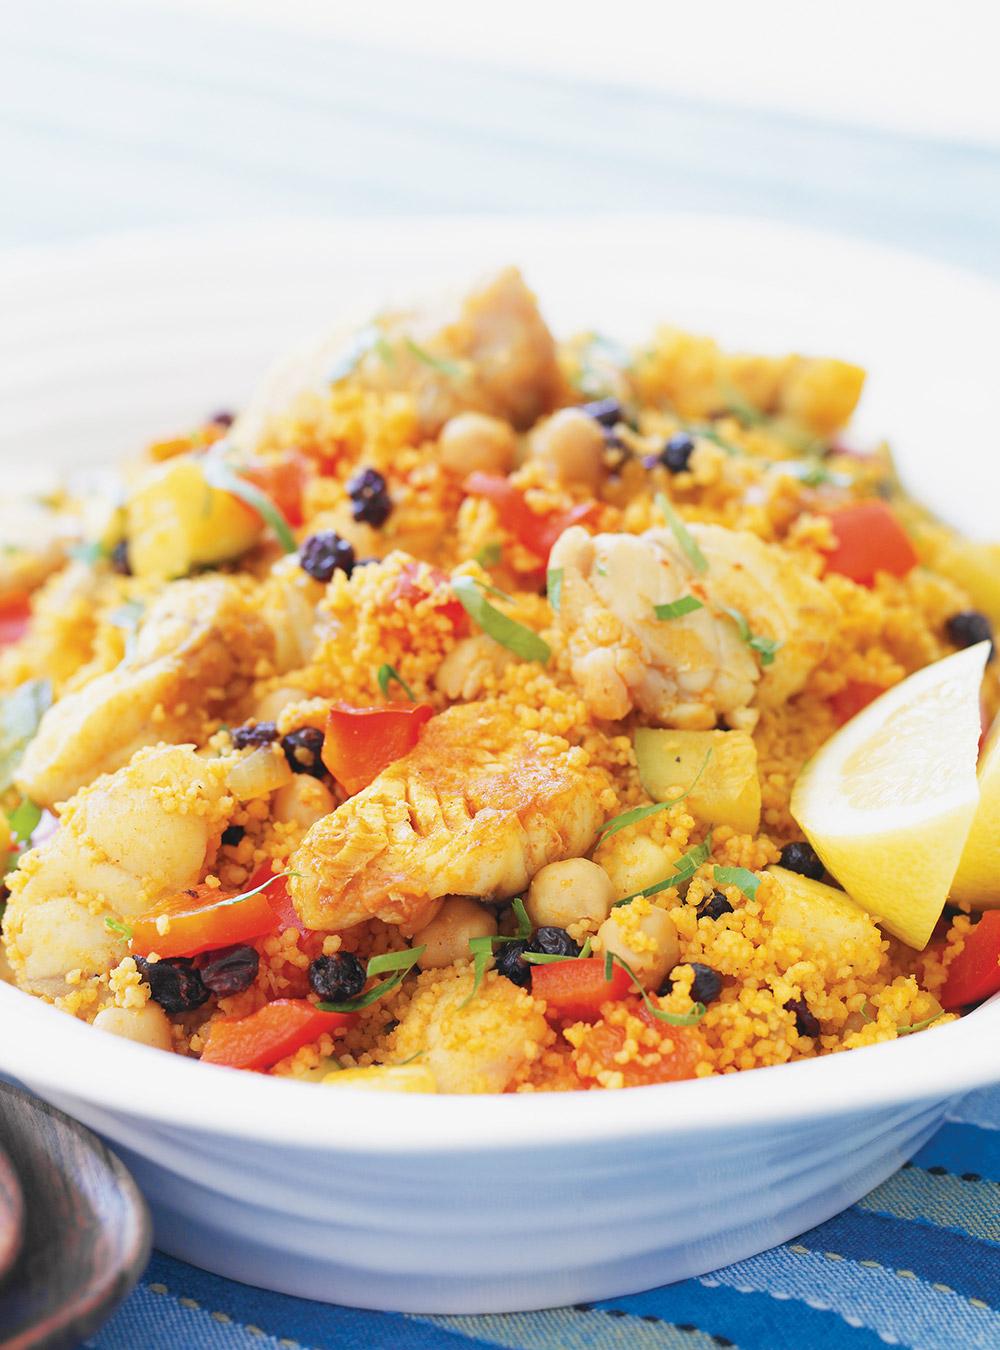 Couscous tunisien au poisson | ricardo